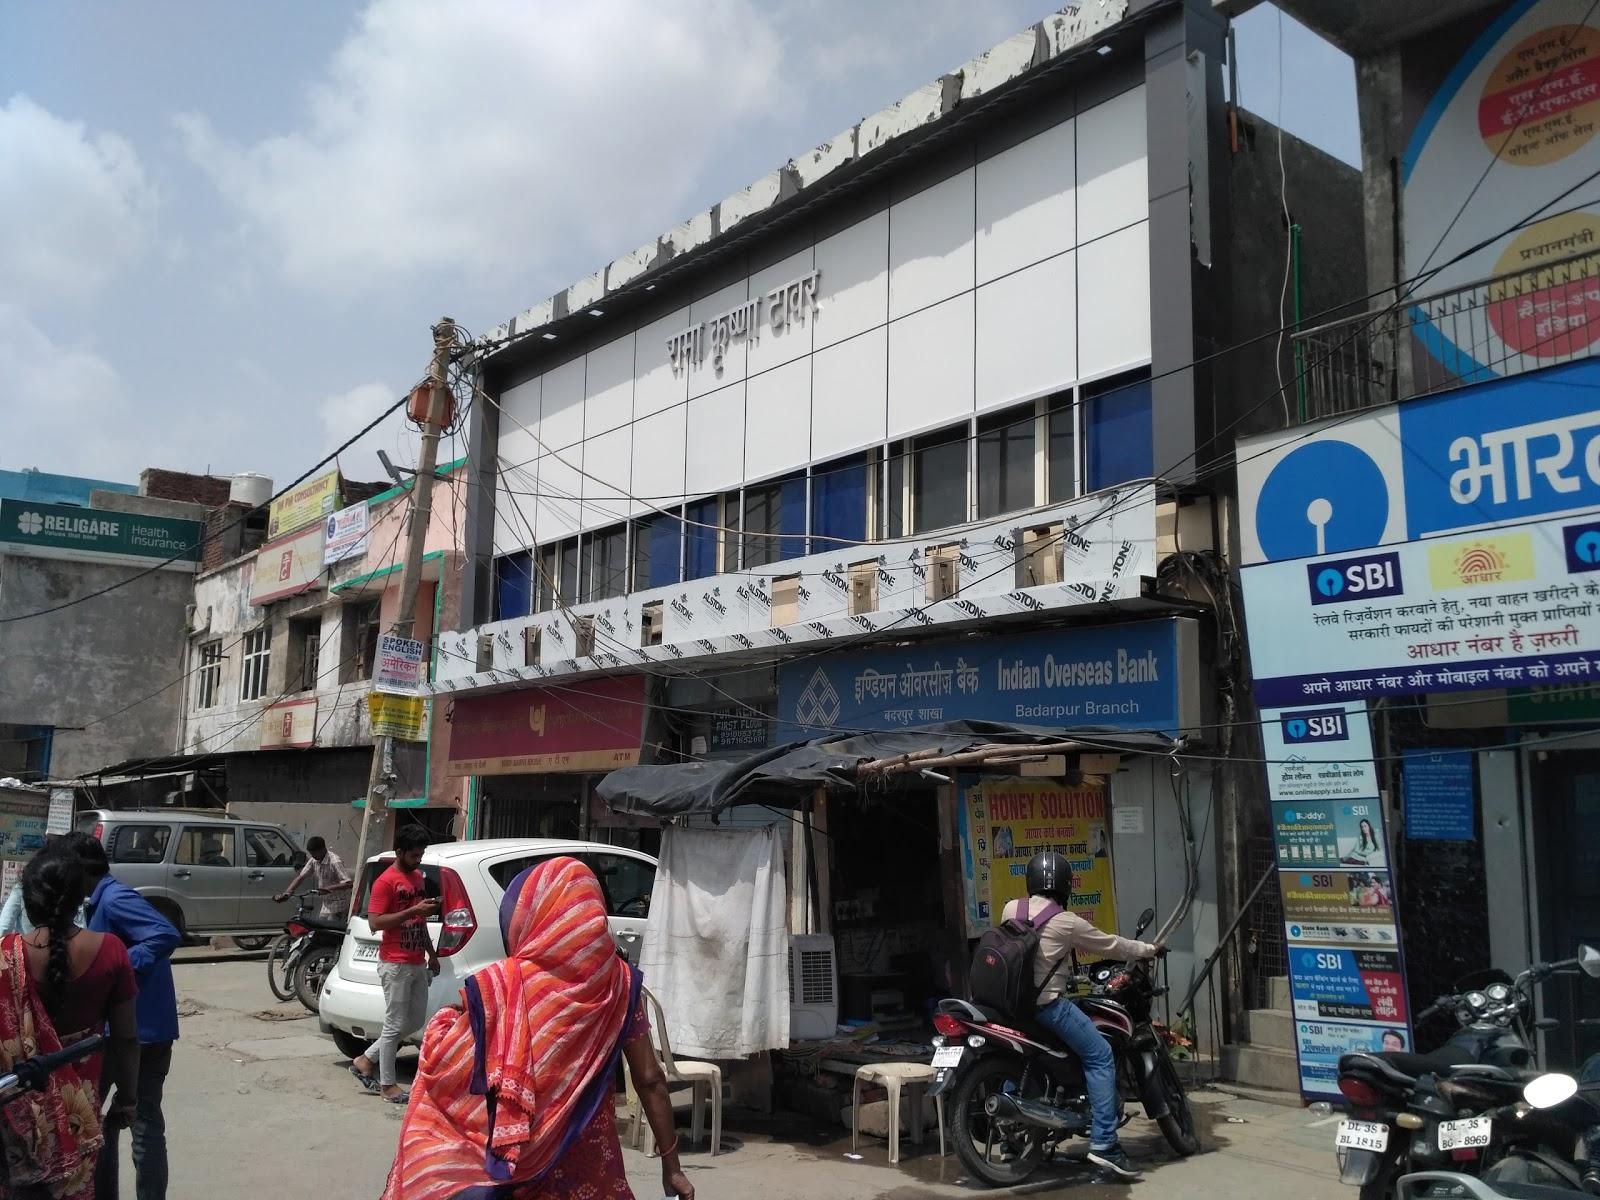 blood bank Indian Overseas Bank near New Delhi Delhi